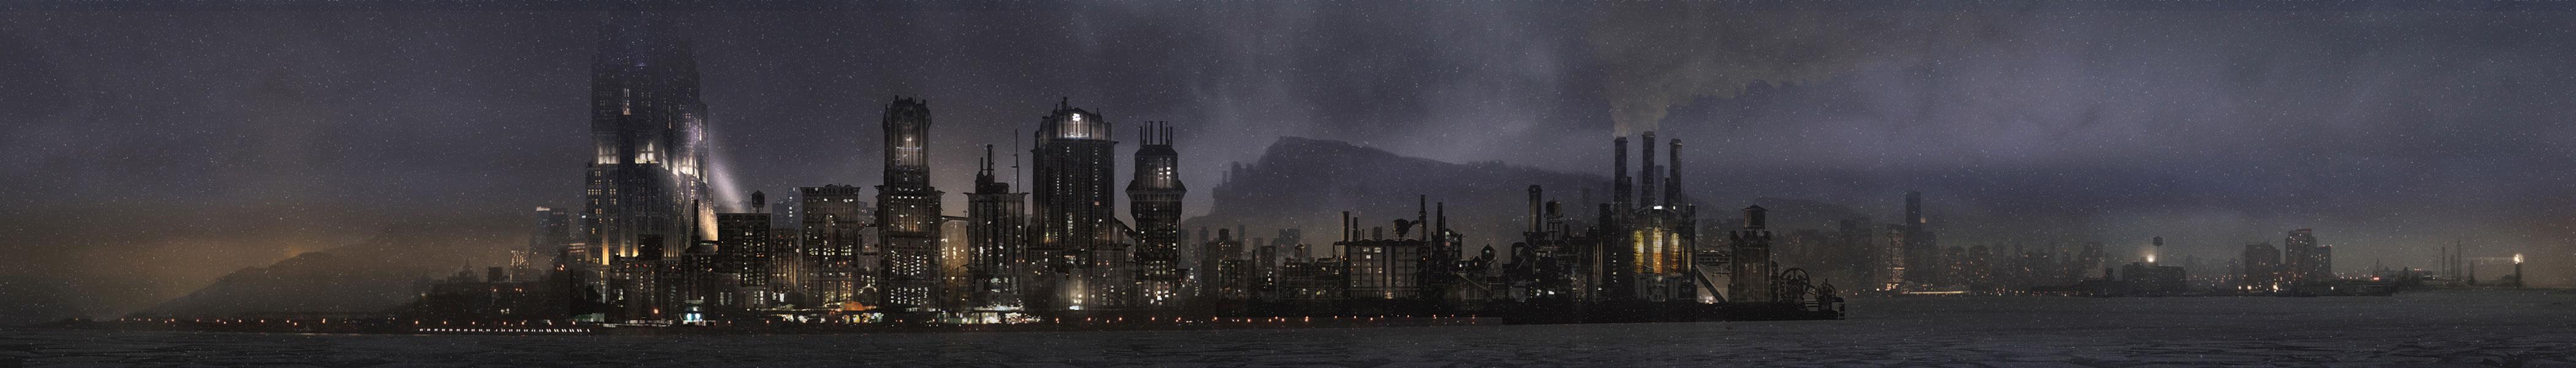 Bao gotham city